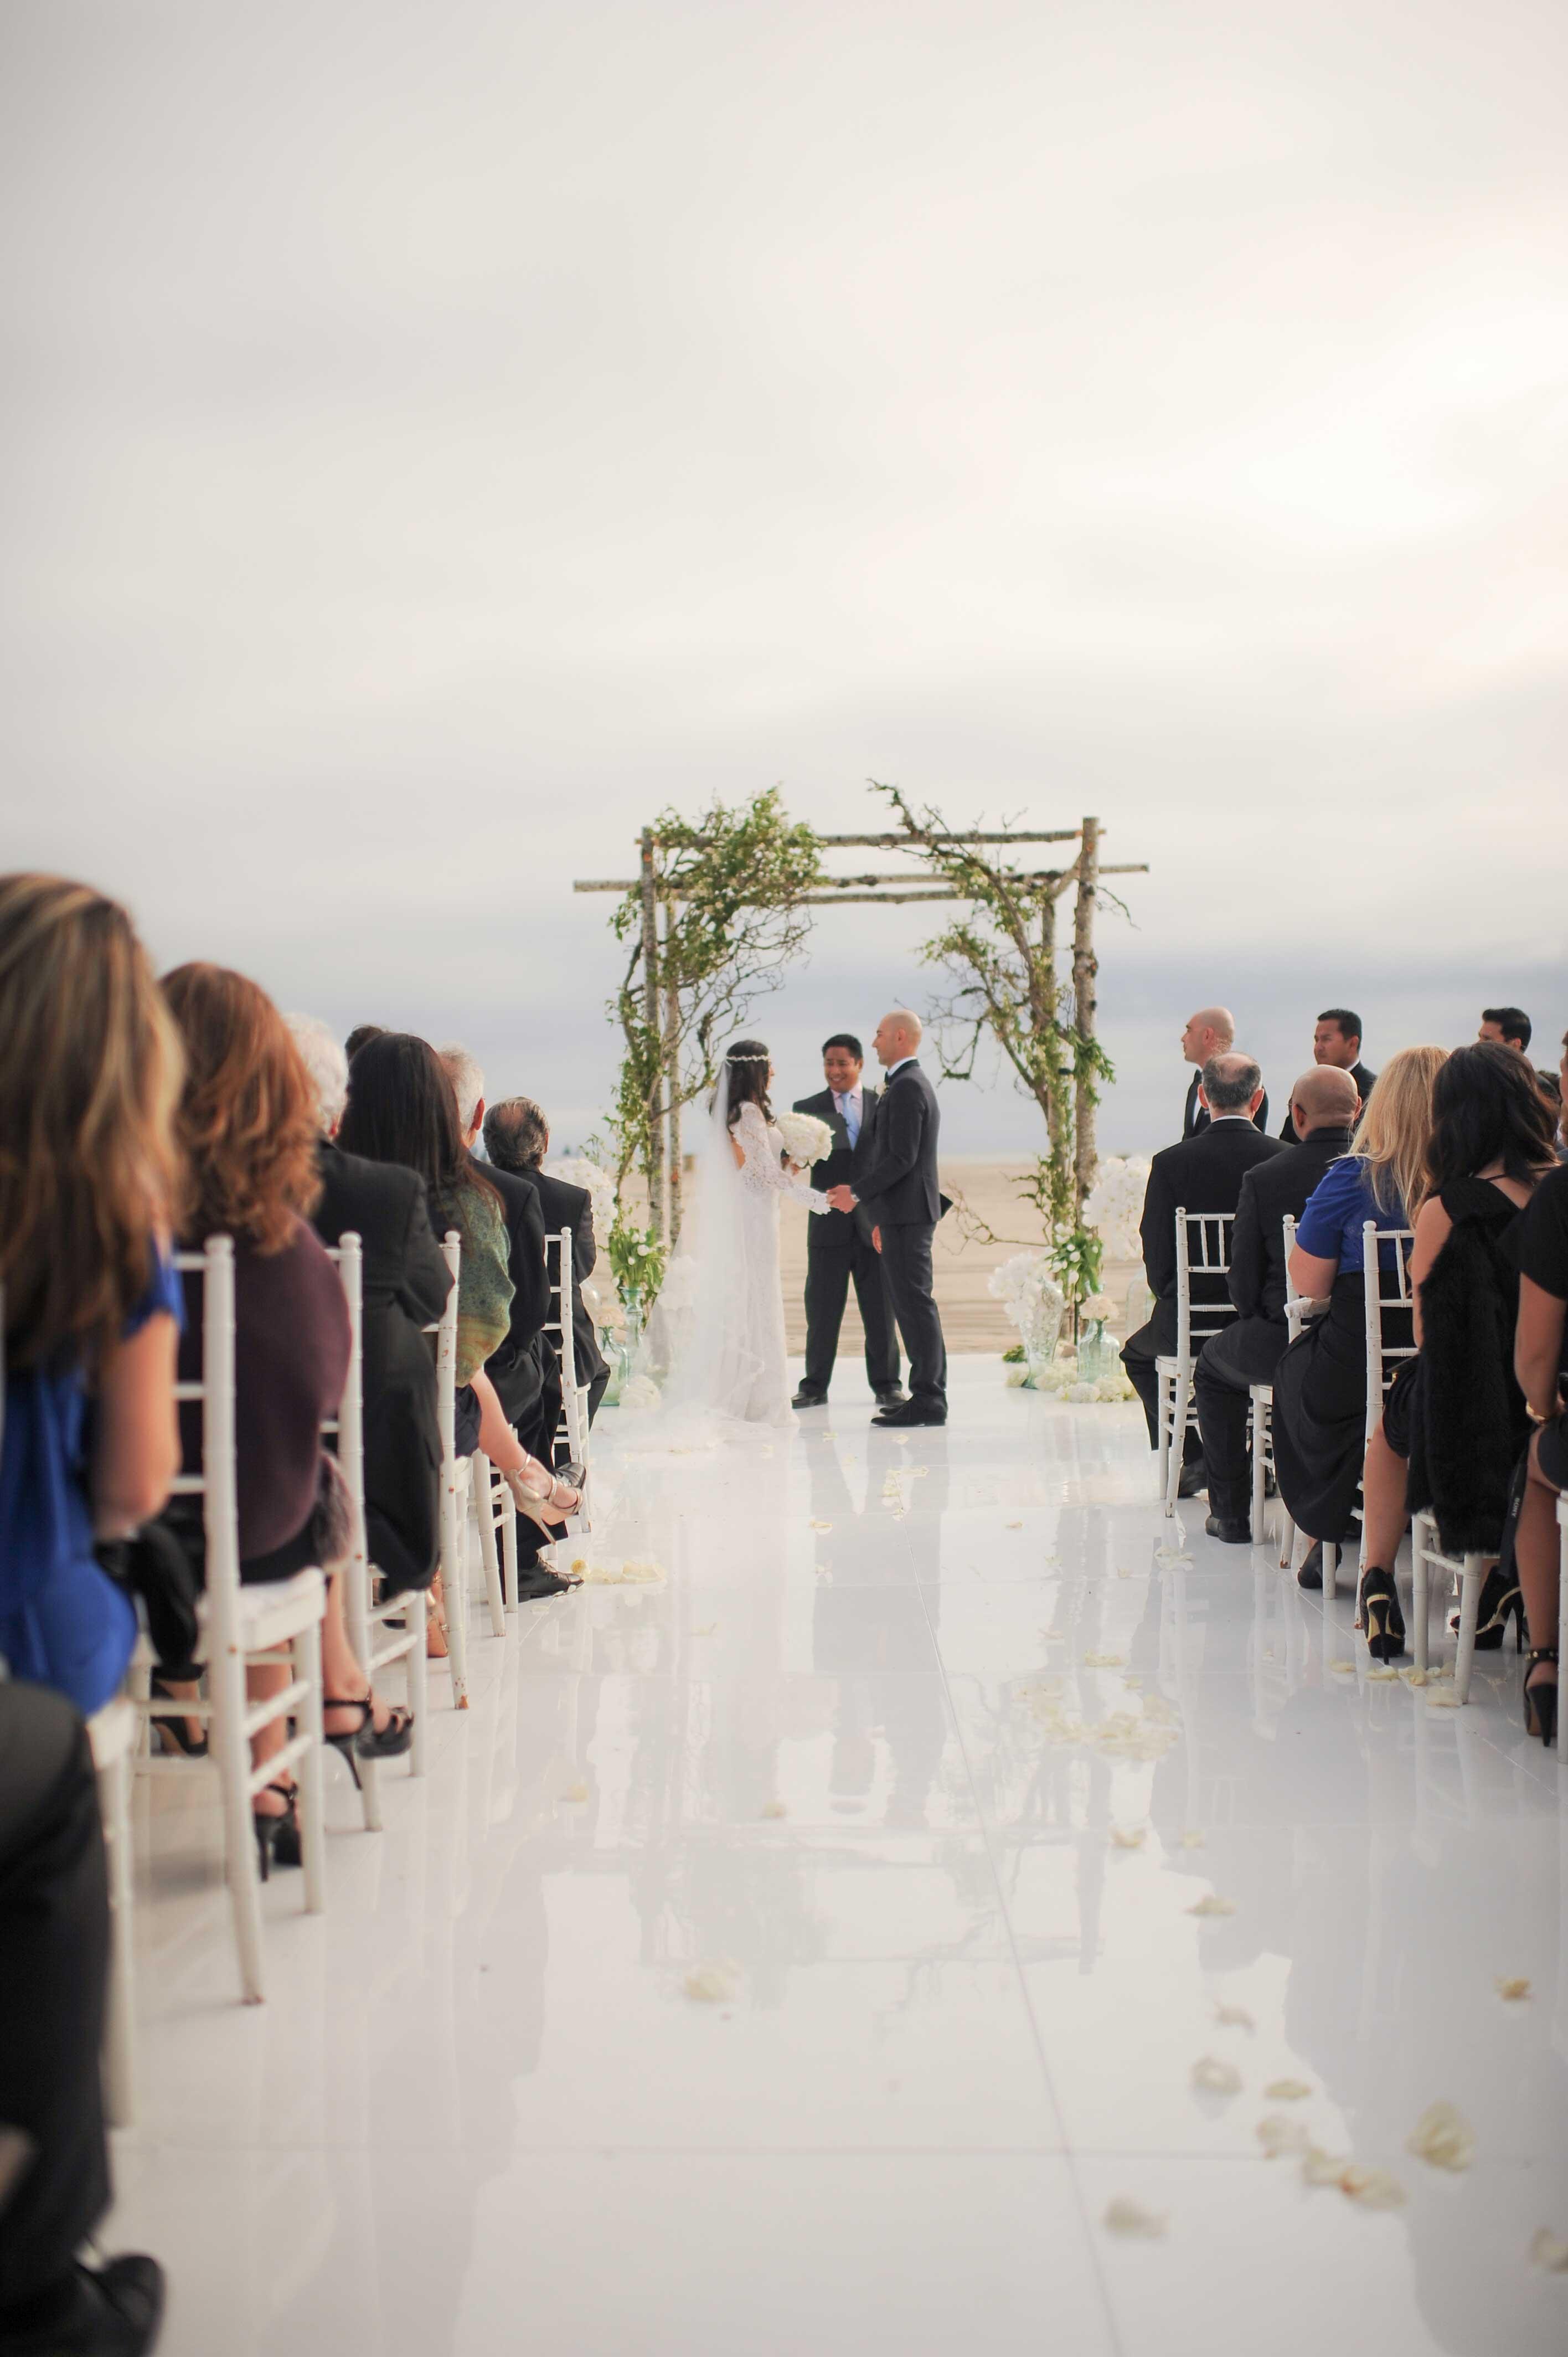 Wedding at Hotel Casa Del Mar on beach in Santa Monica, California